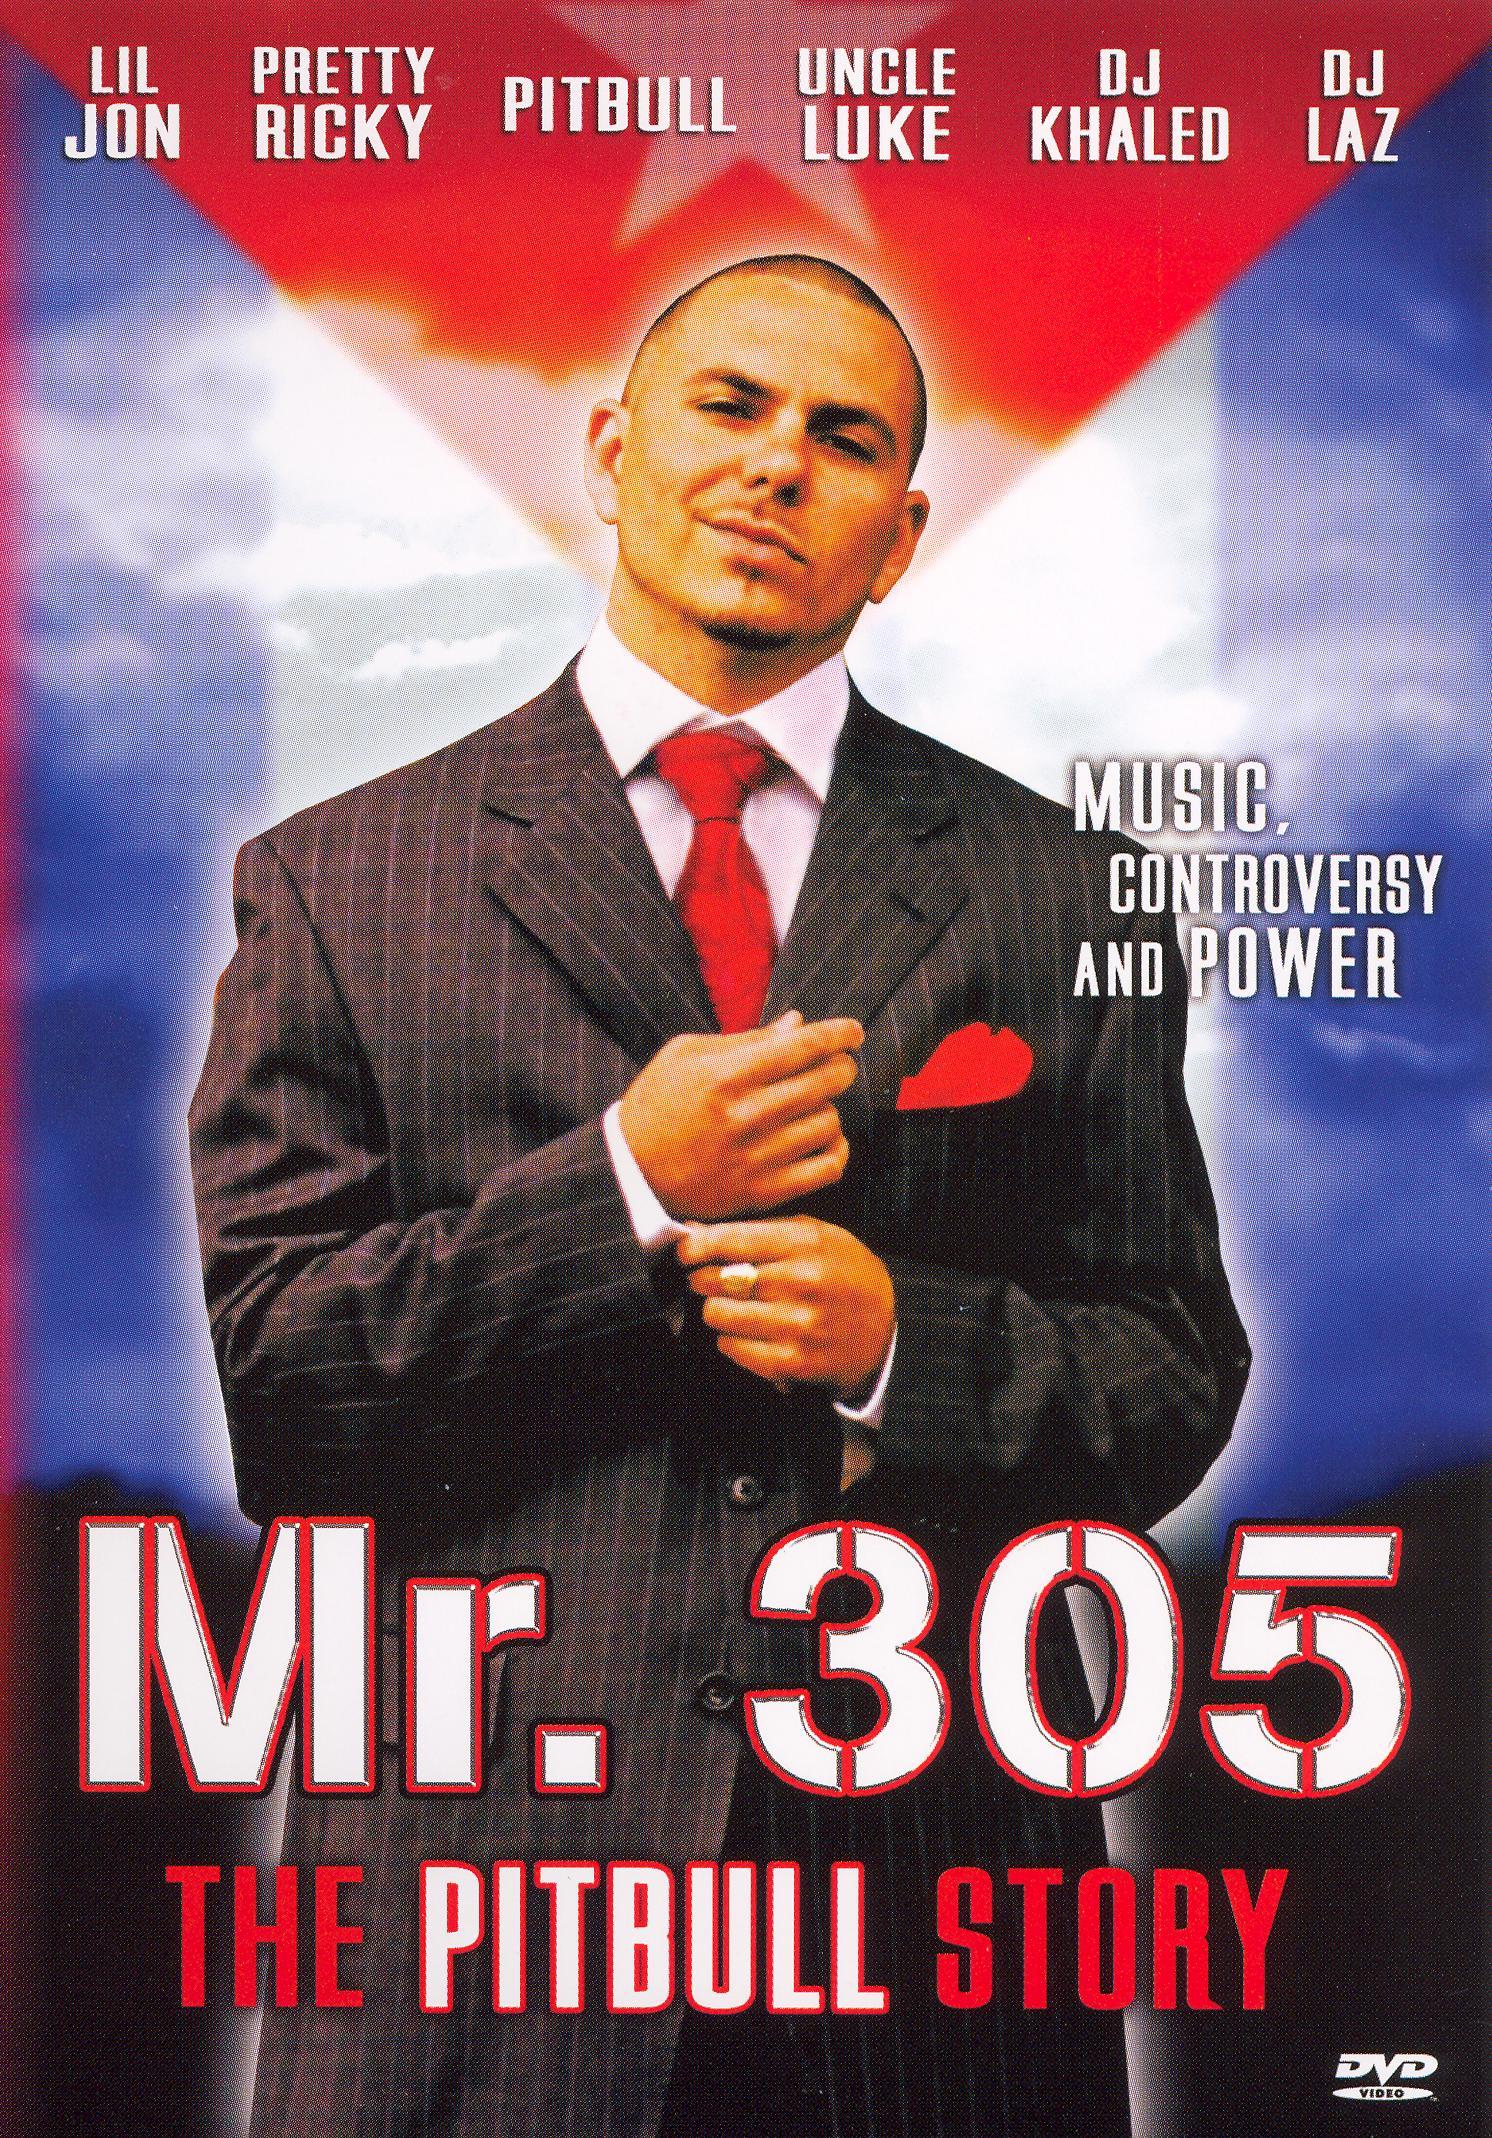 Mr. 305 (The Pitbull Story)